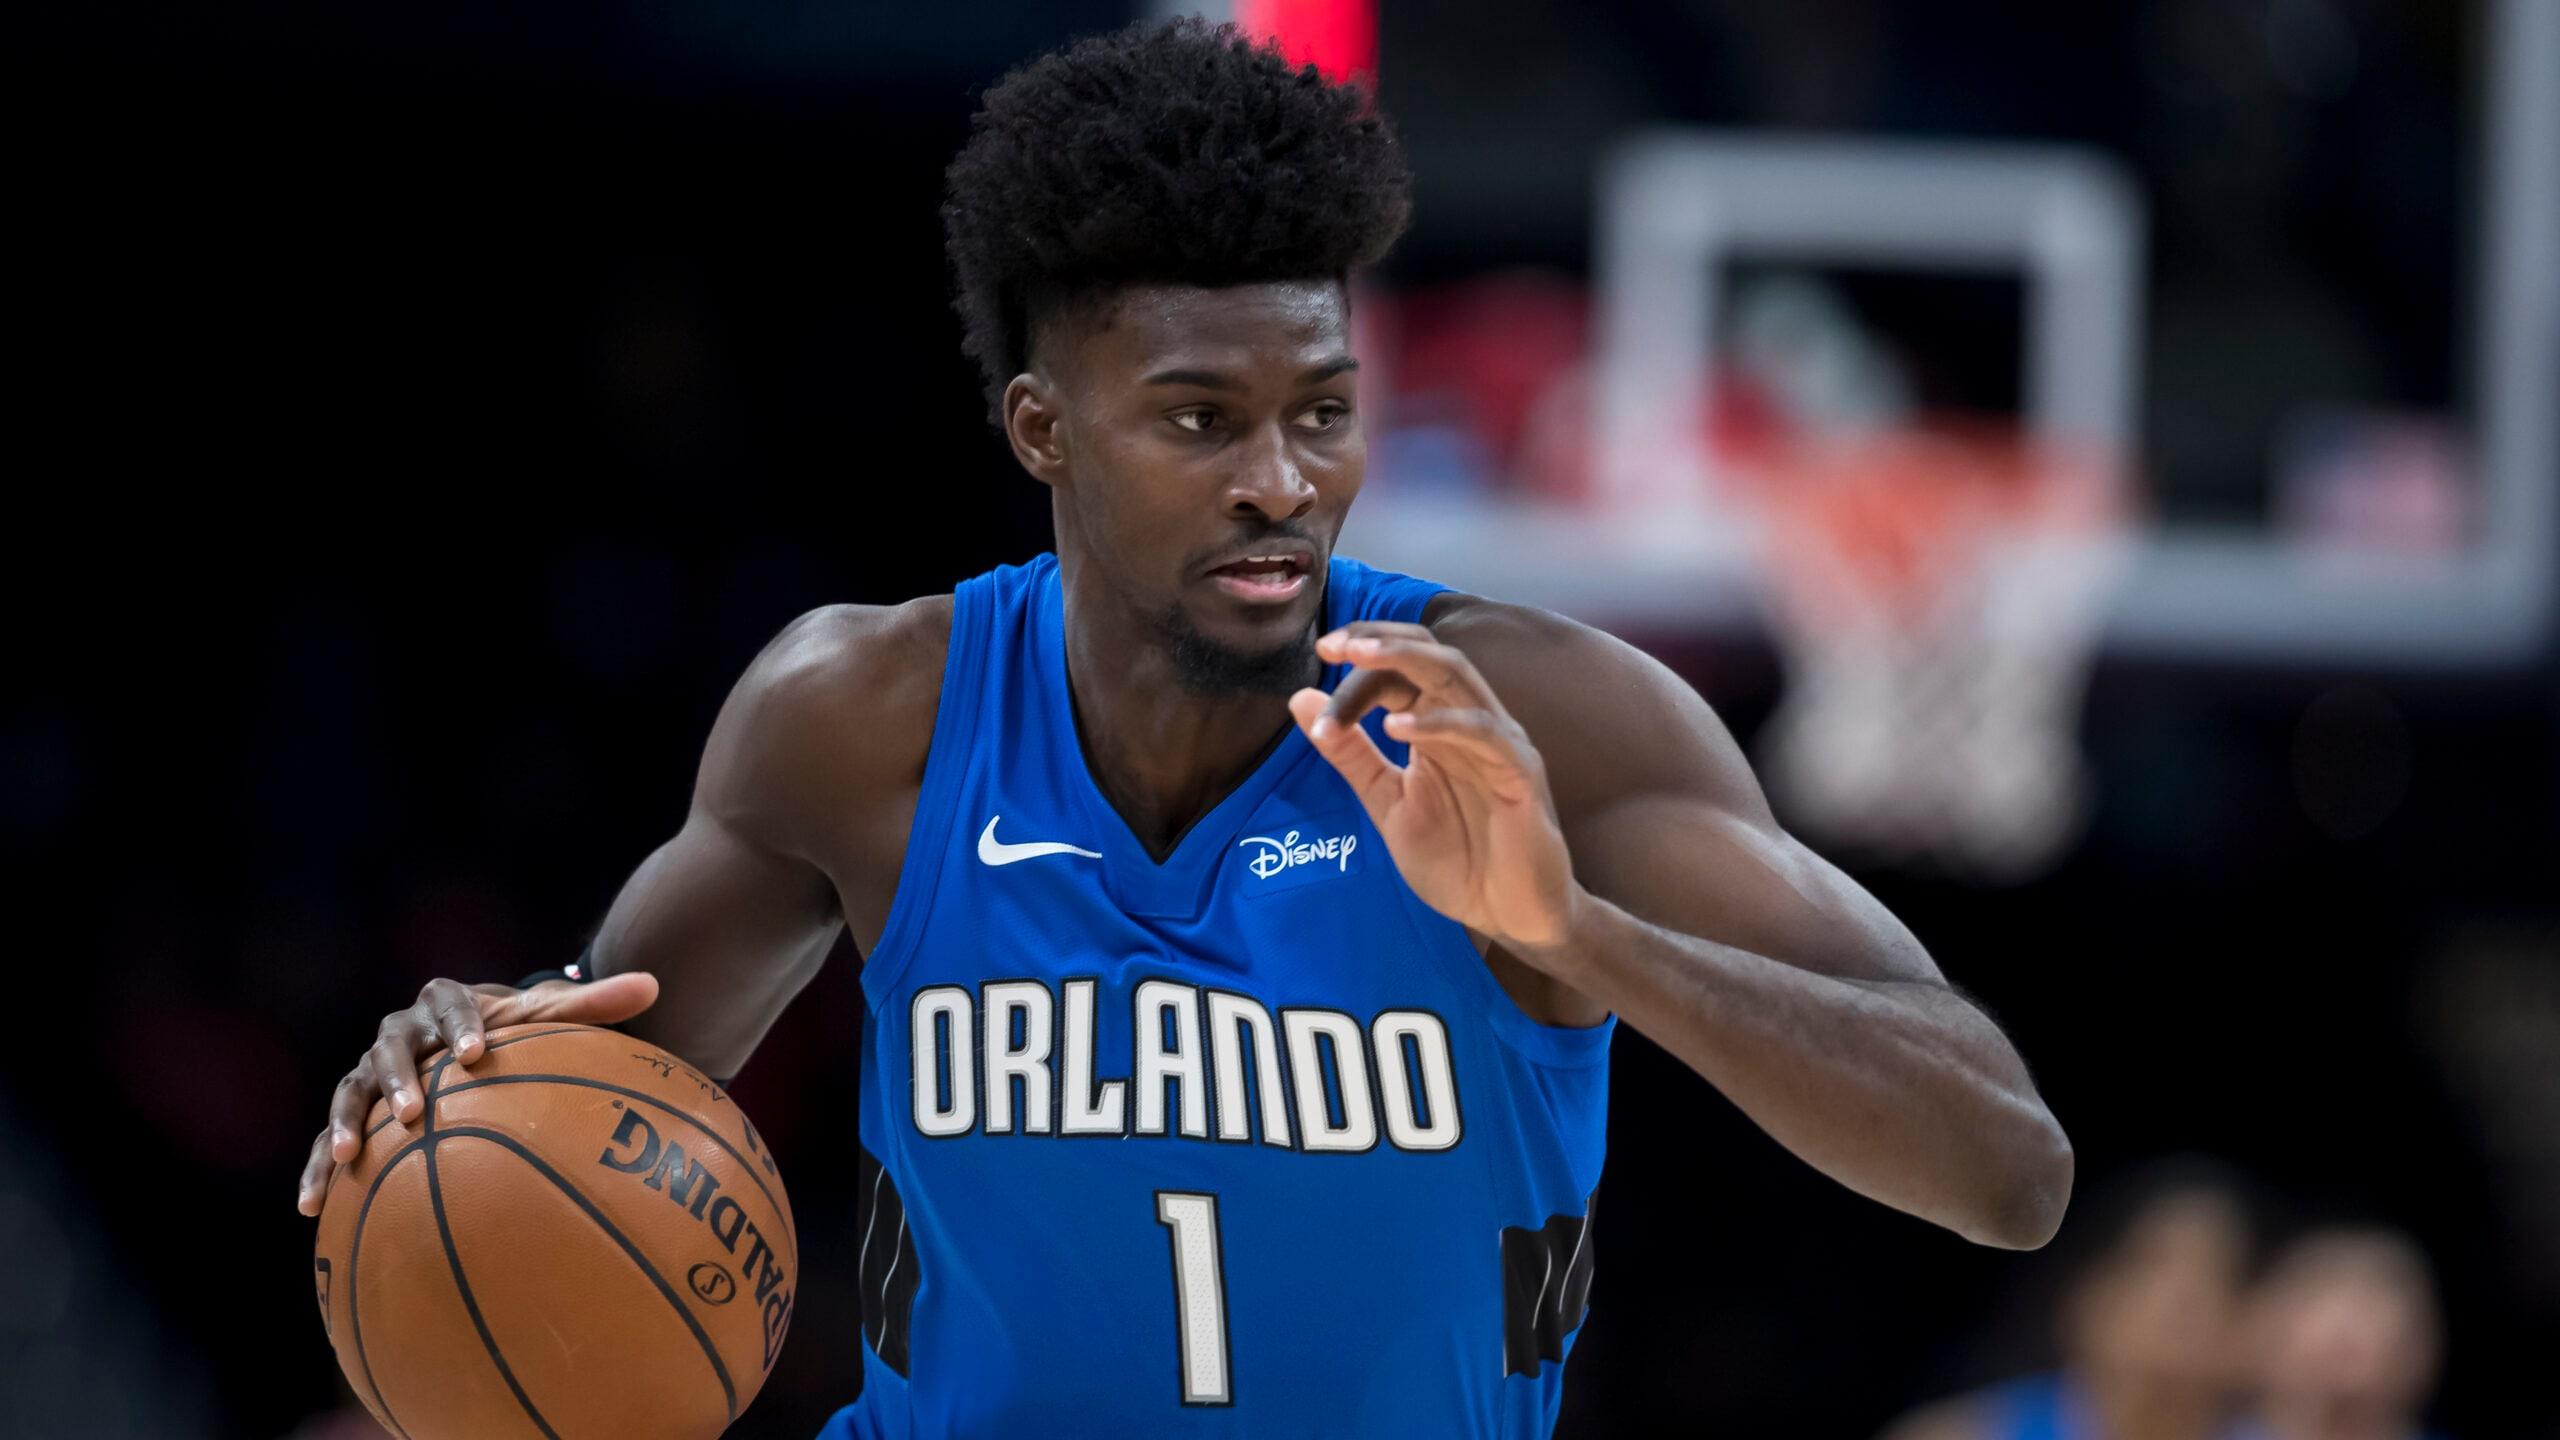 NBA fantasy basketball sleepers for the 2021-22 season